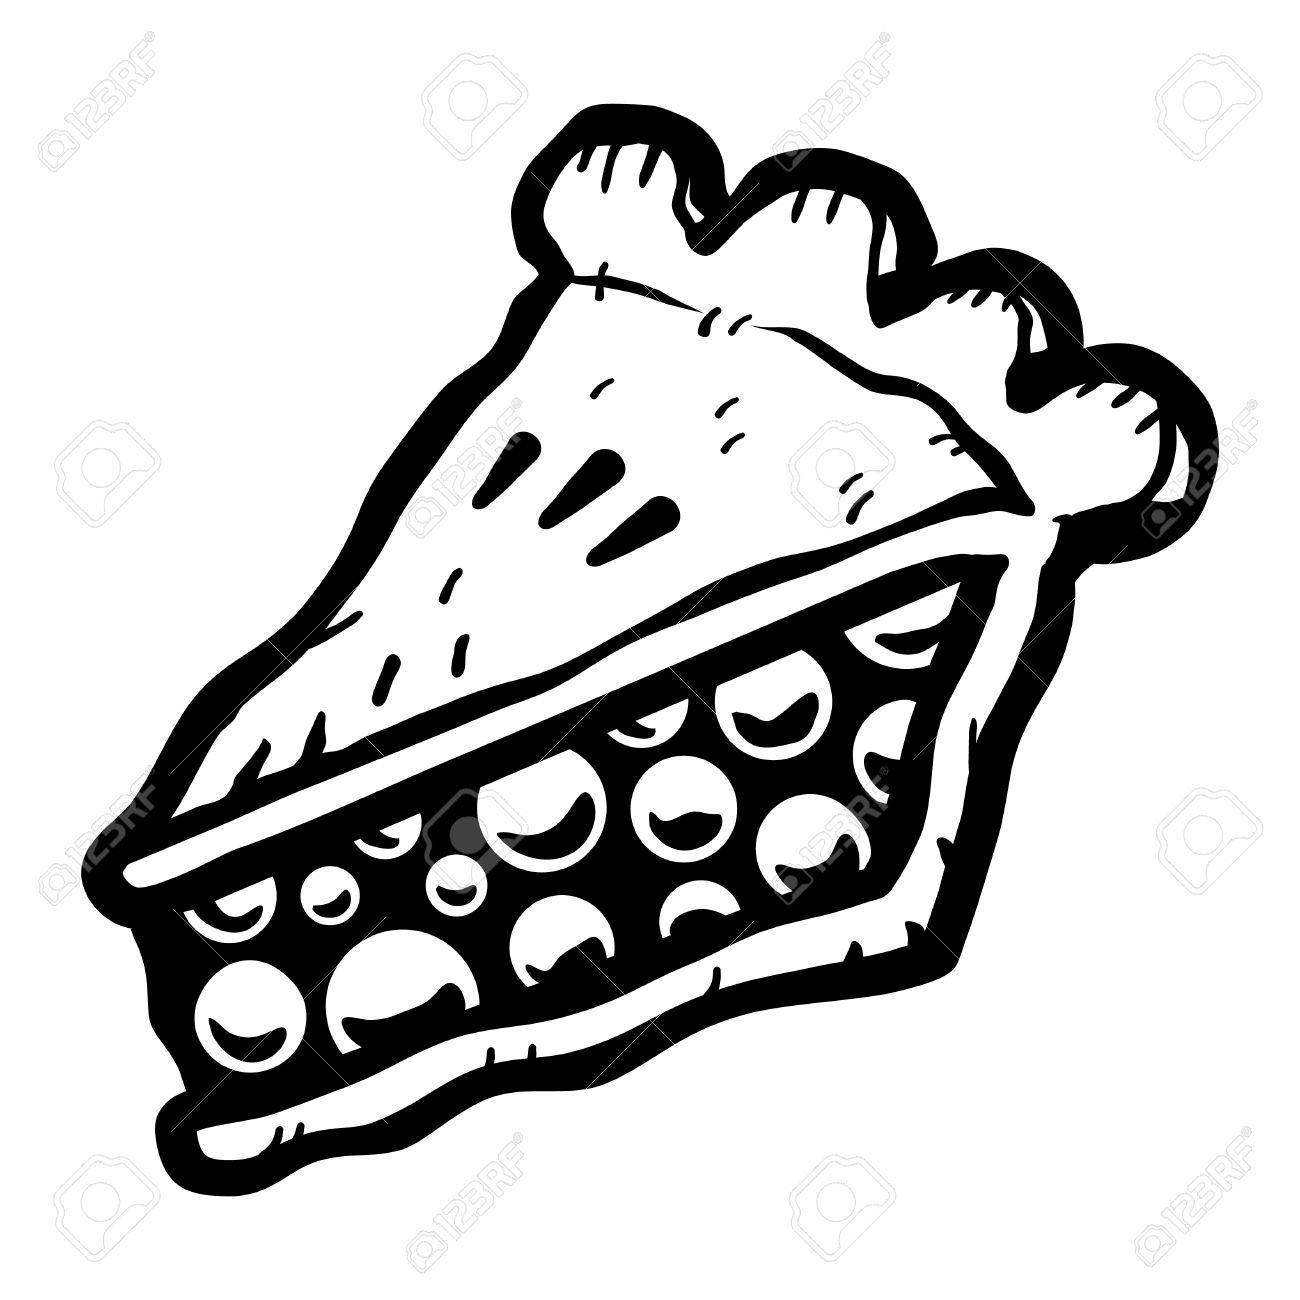 Pie slice clipart 6 » Clipart Portal.